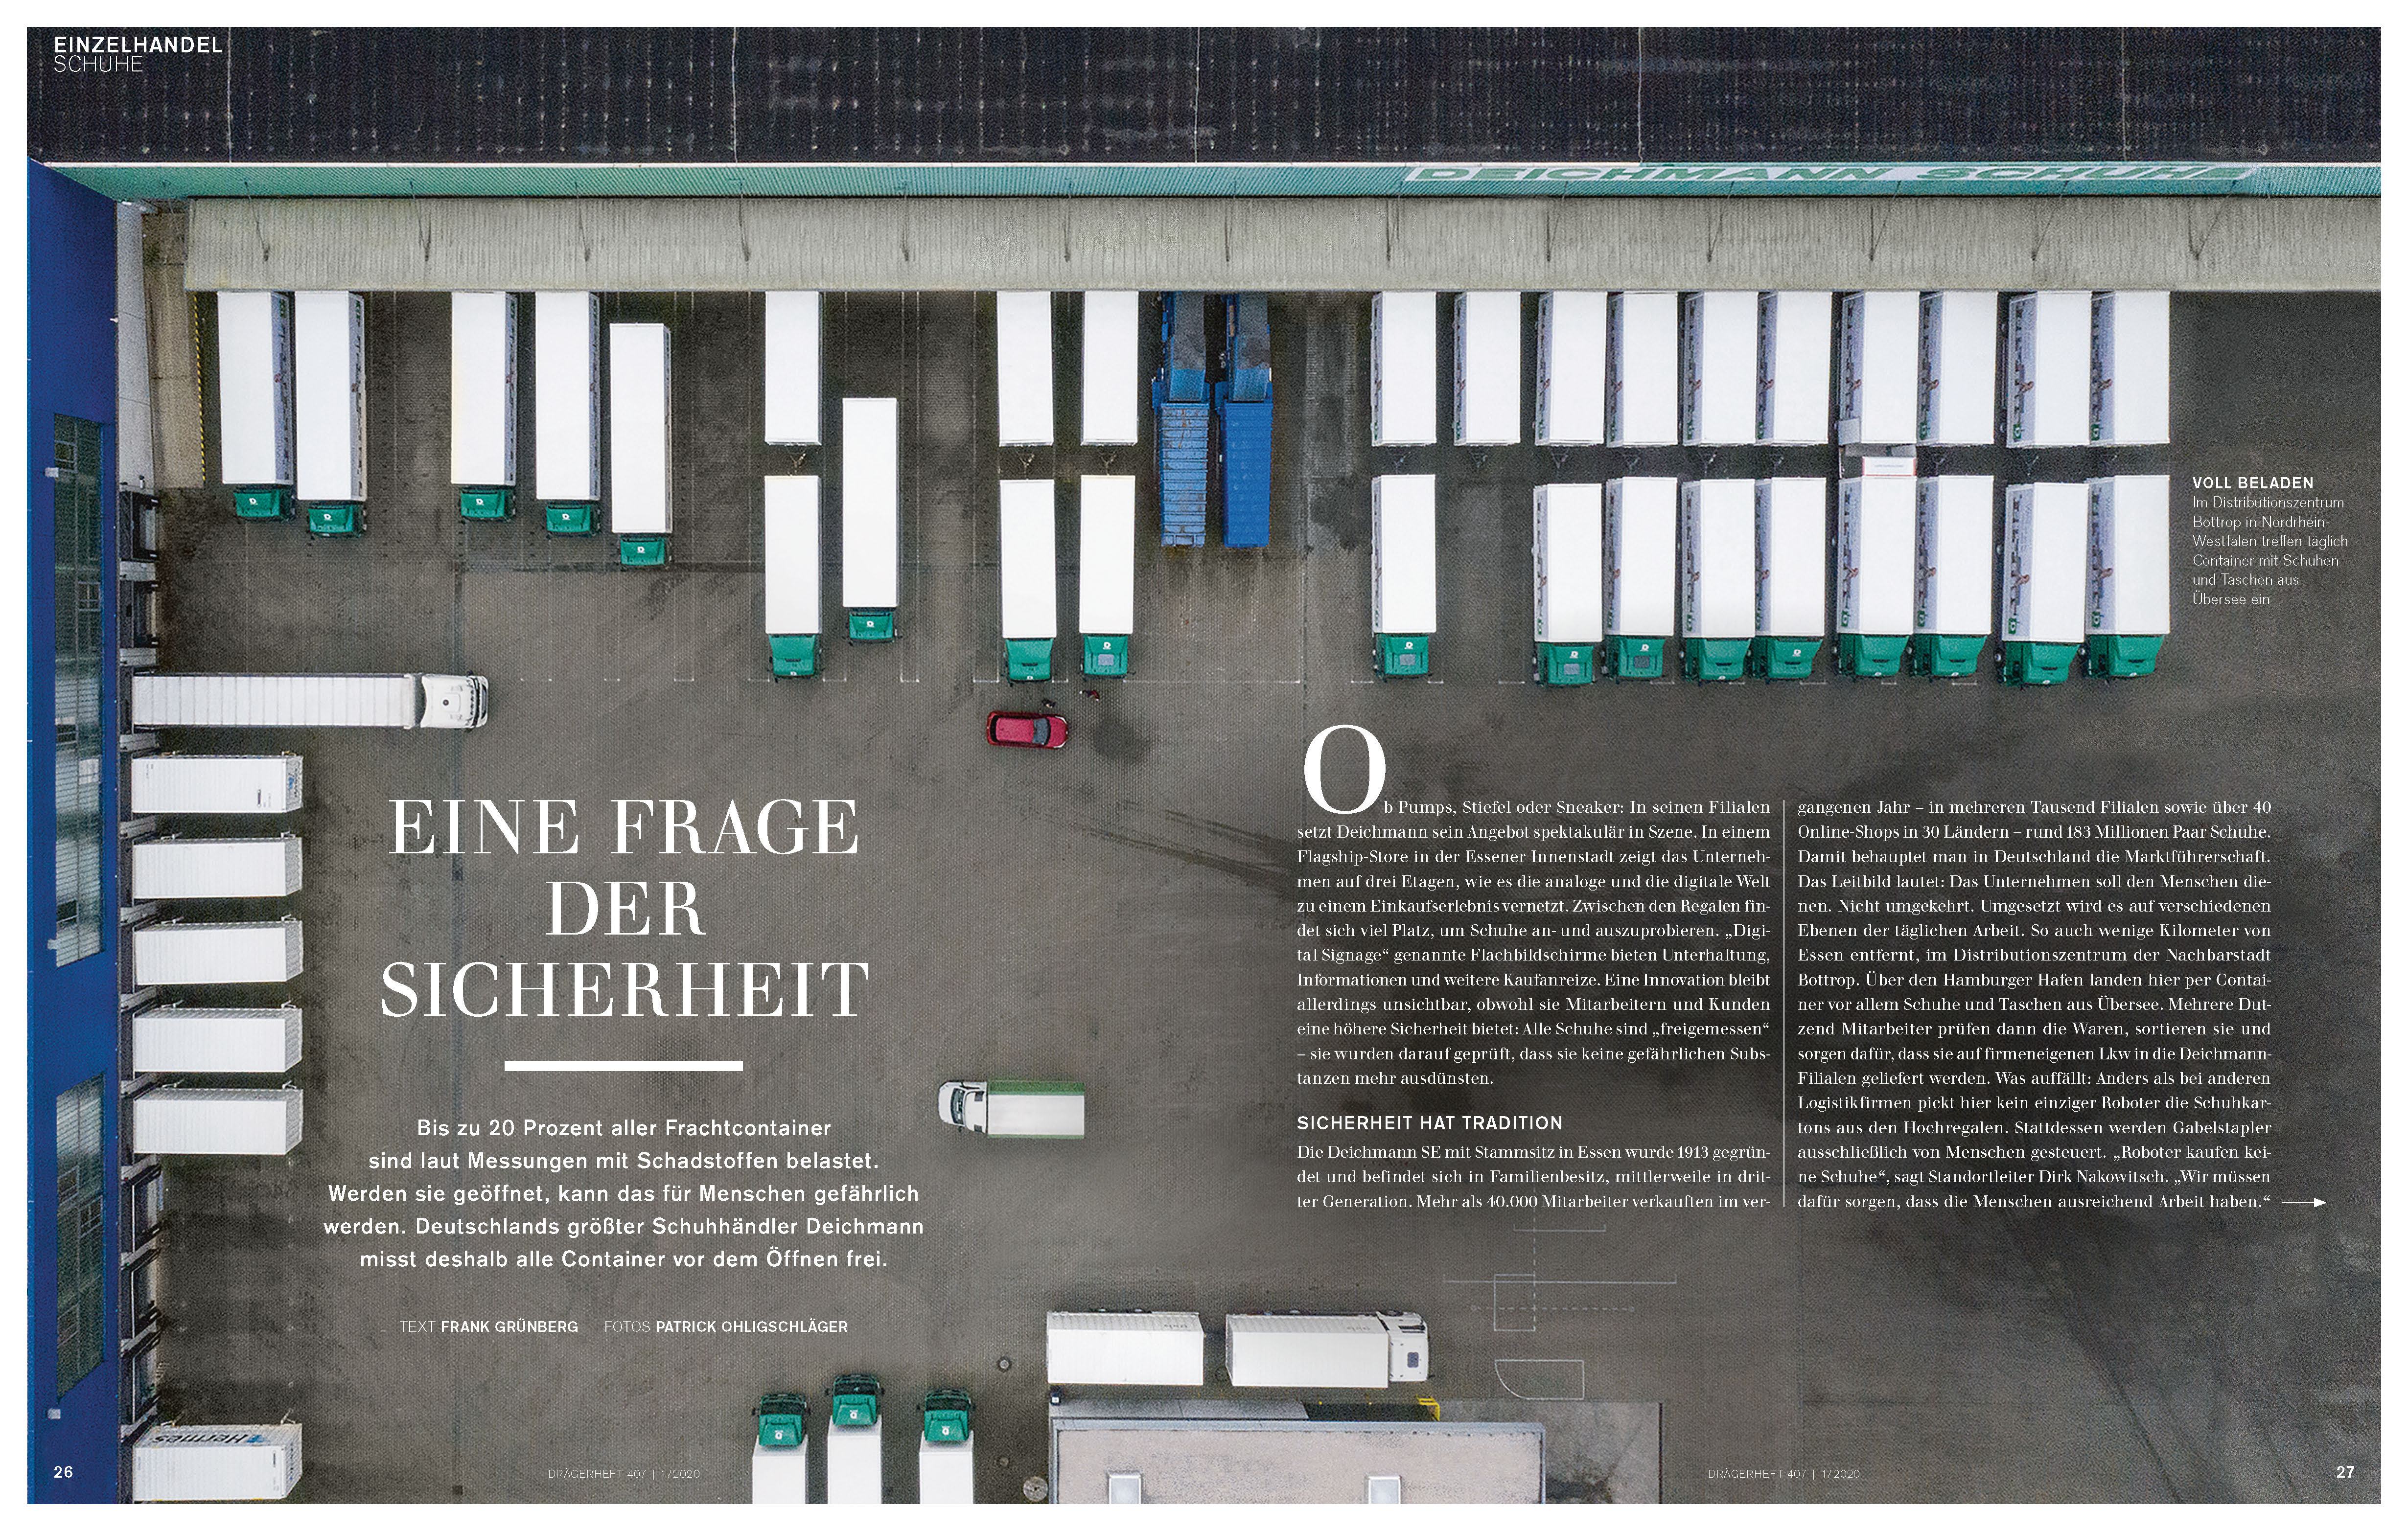 Draeger_407_Deichmann_01